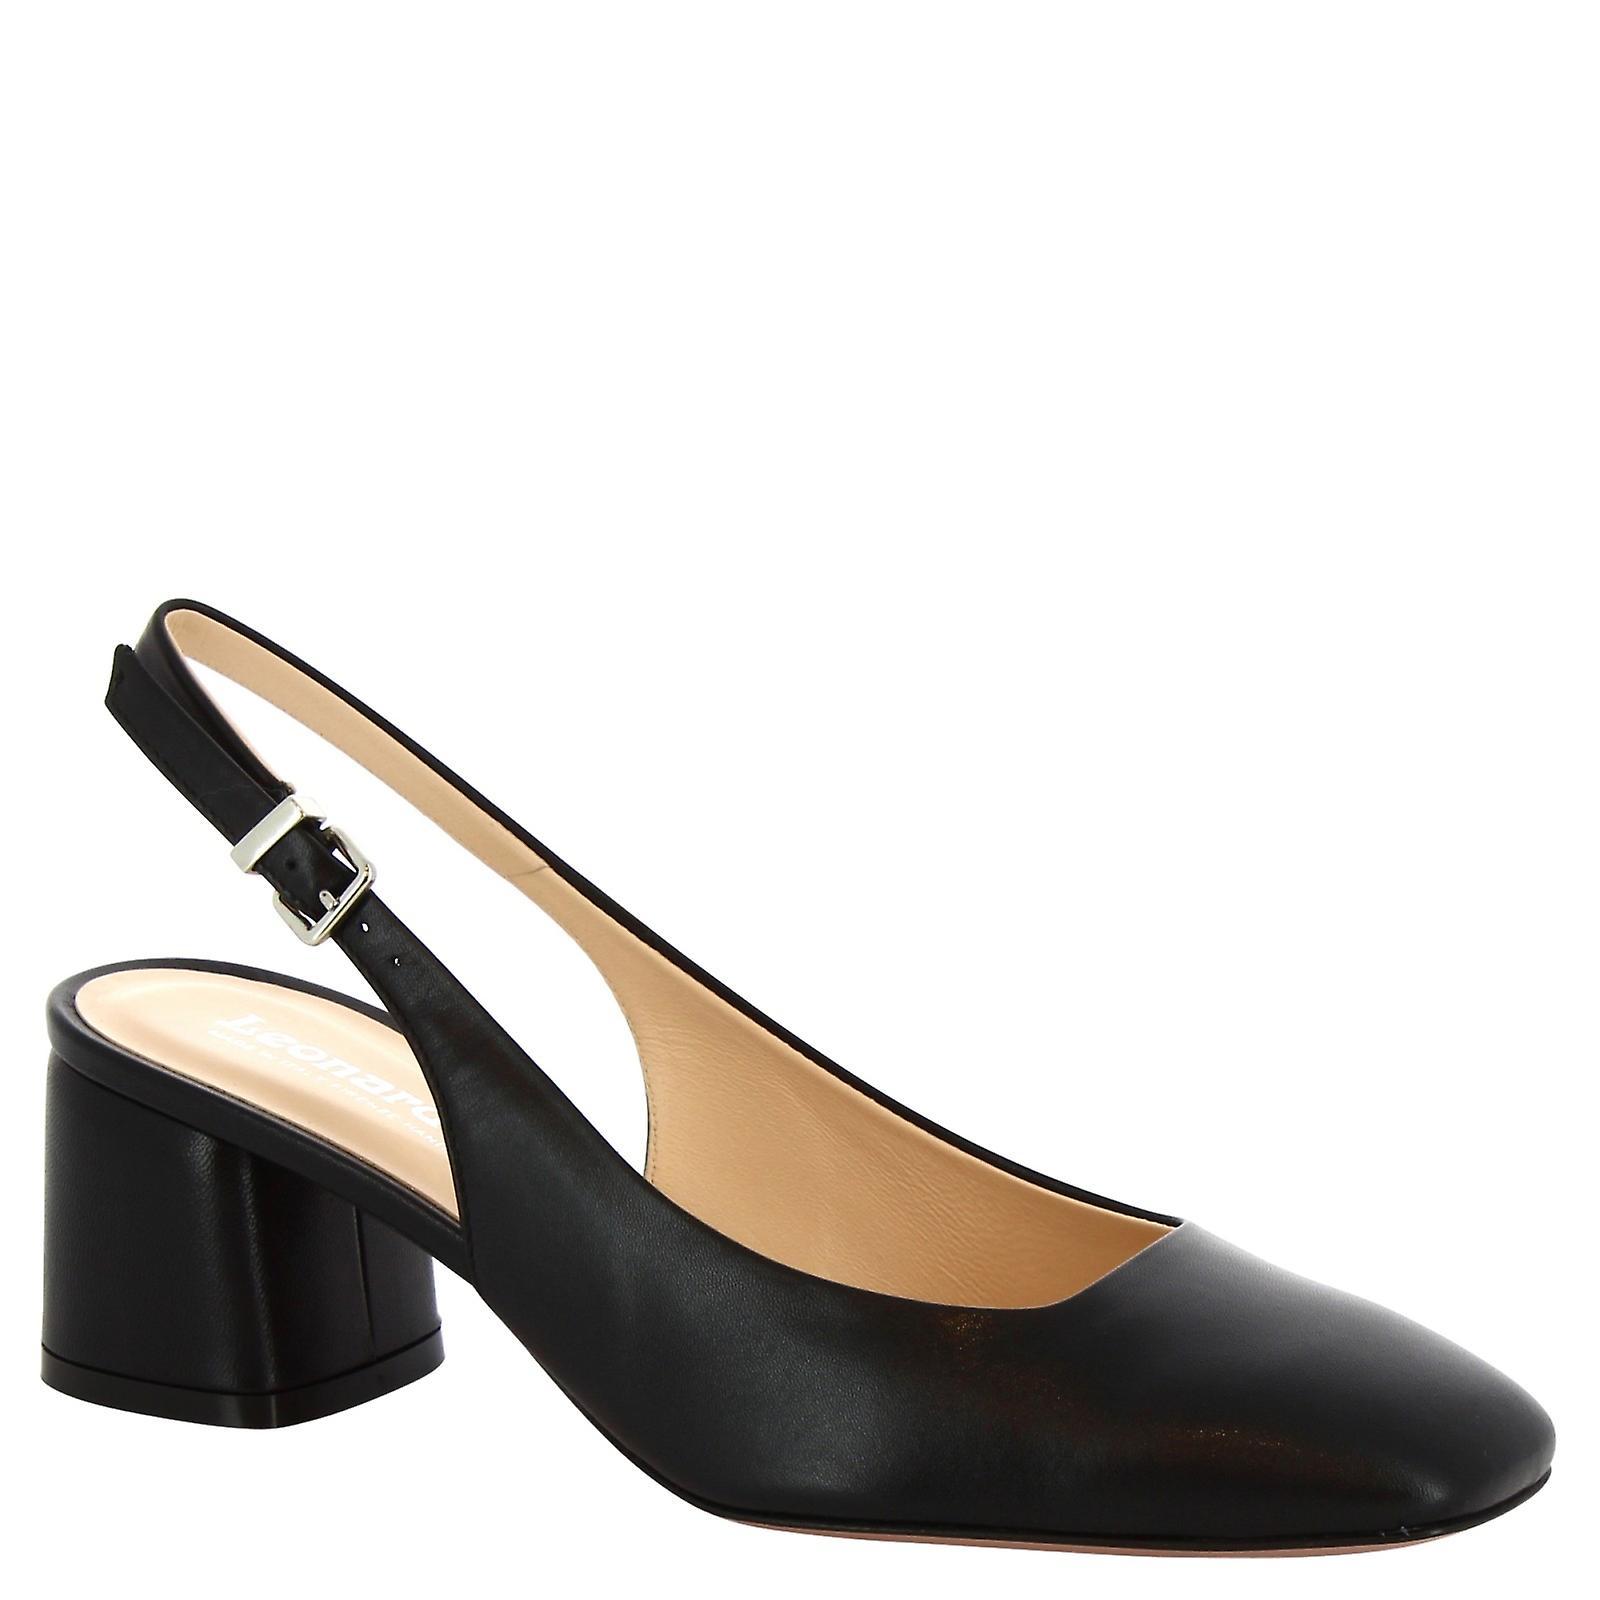 Leonardo Shoes Women's handmade slingback pumps shoes in black calf leather PLNOb